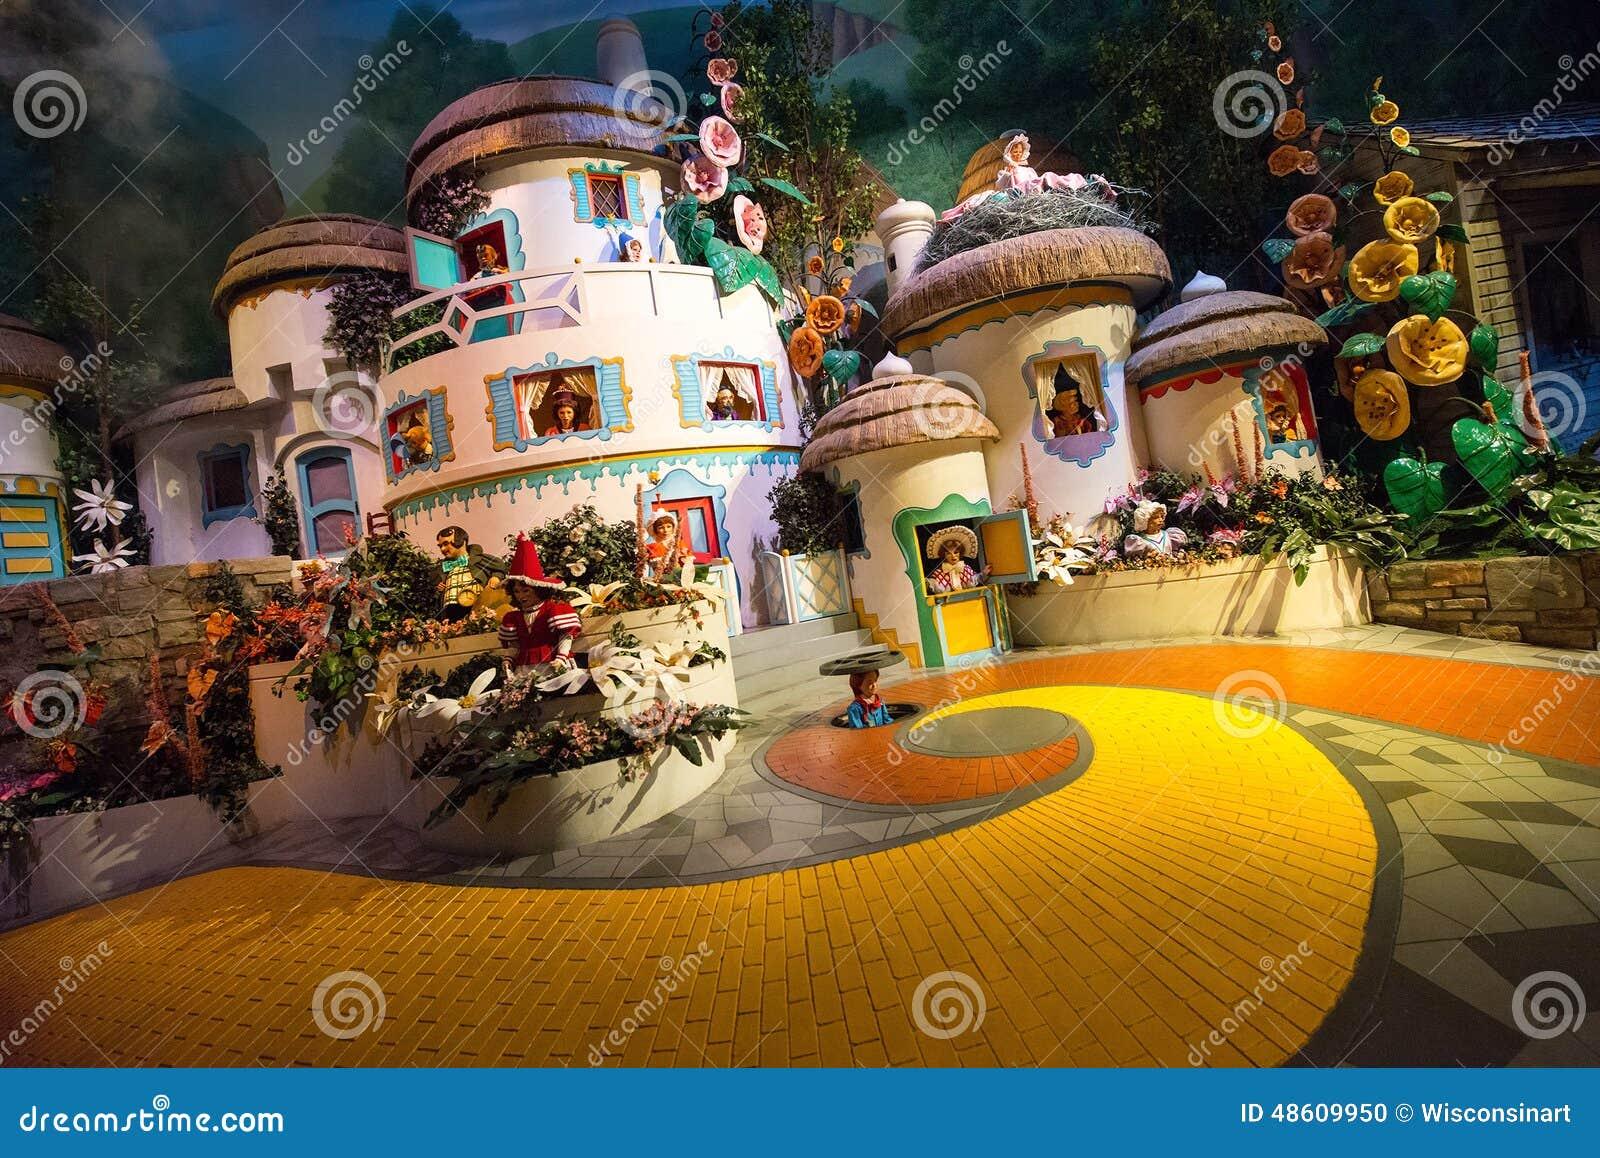 Disney-Weltzauberer Unze Munchkinland